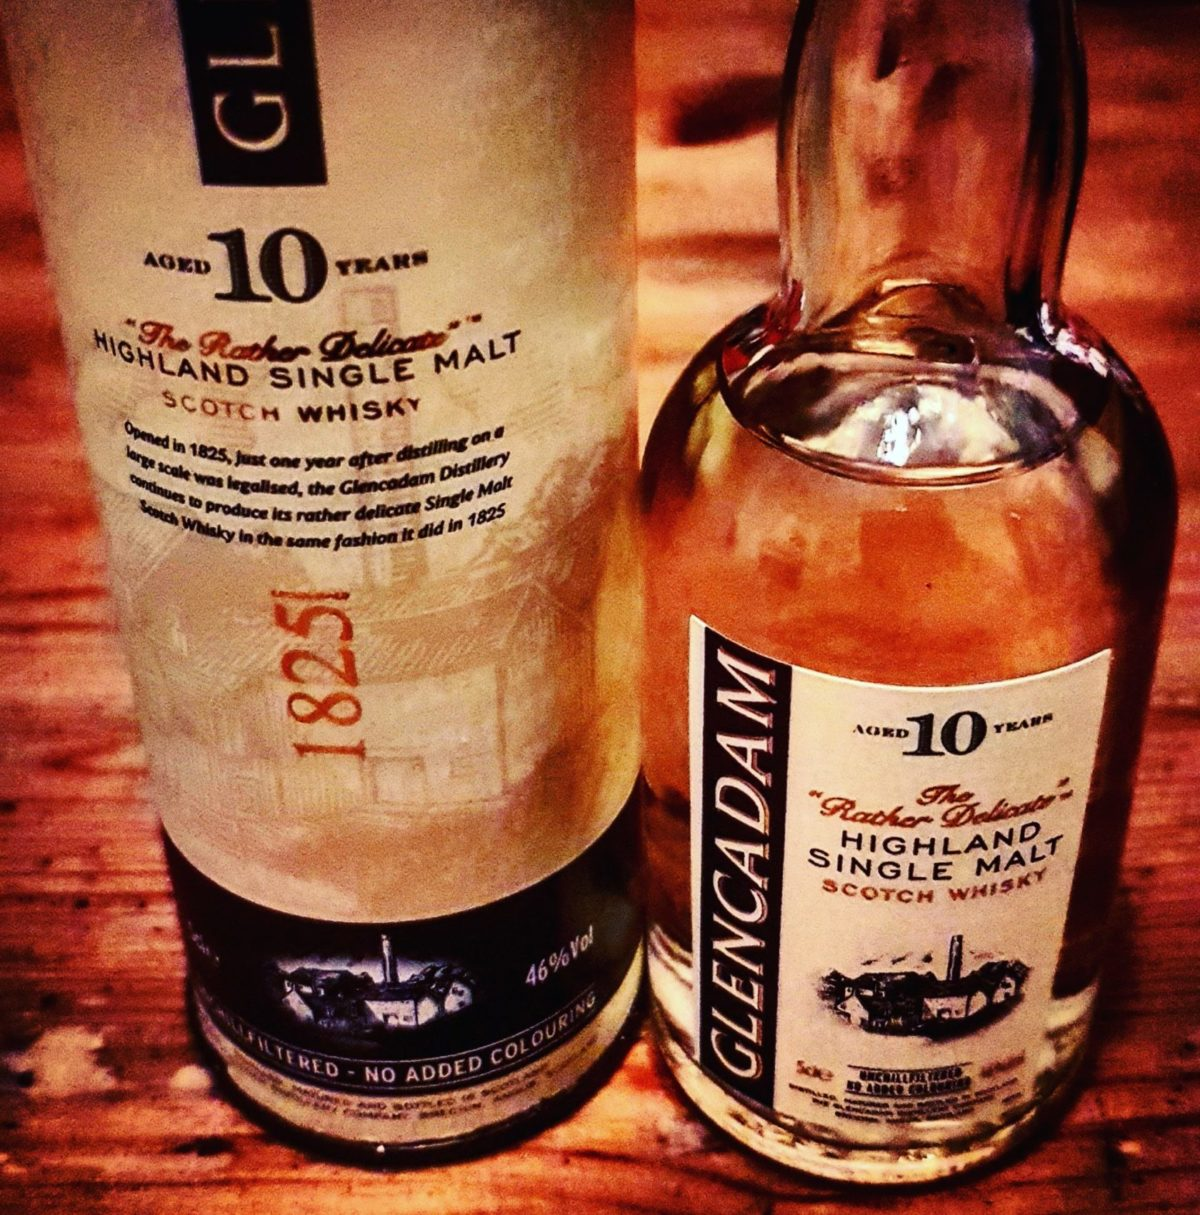 Glencadam 10 Jahre Highland Single Malt Scotch Whisky